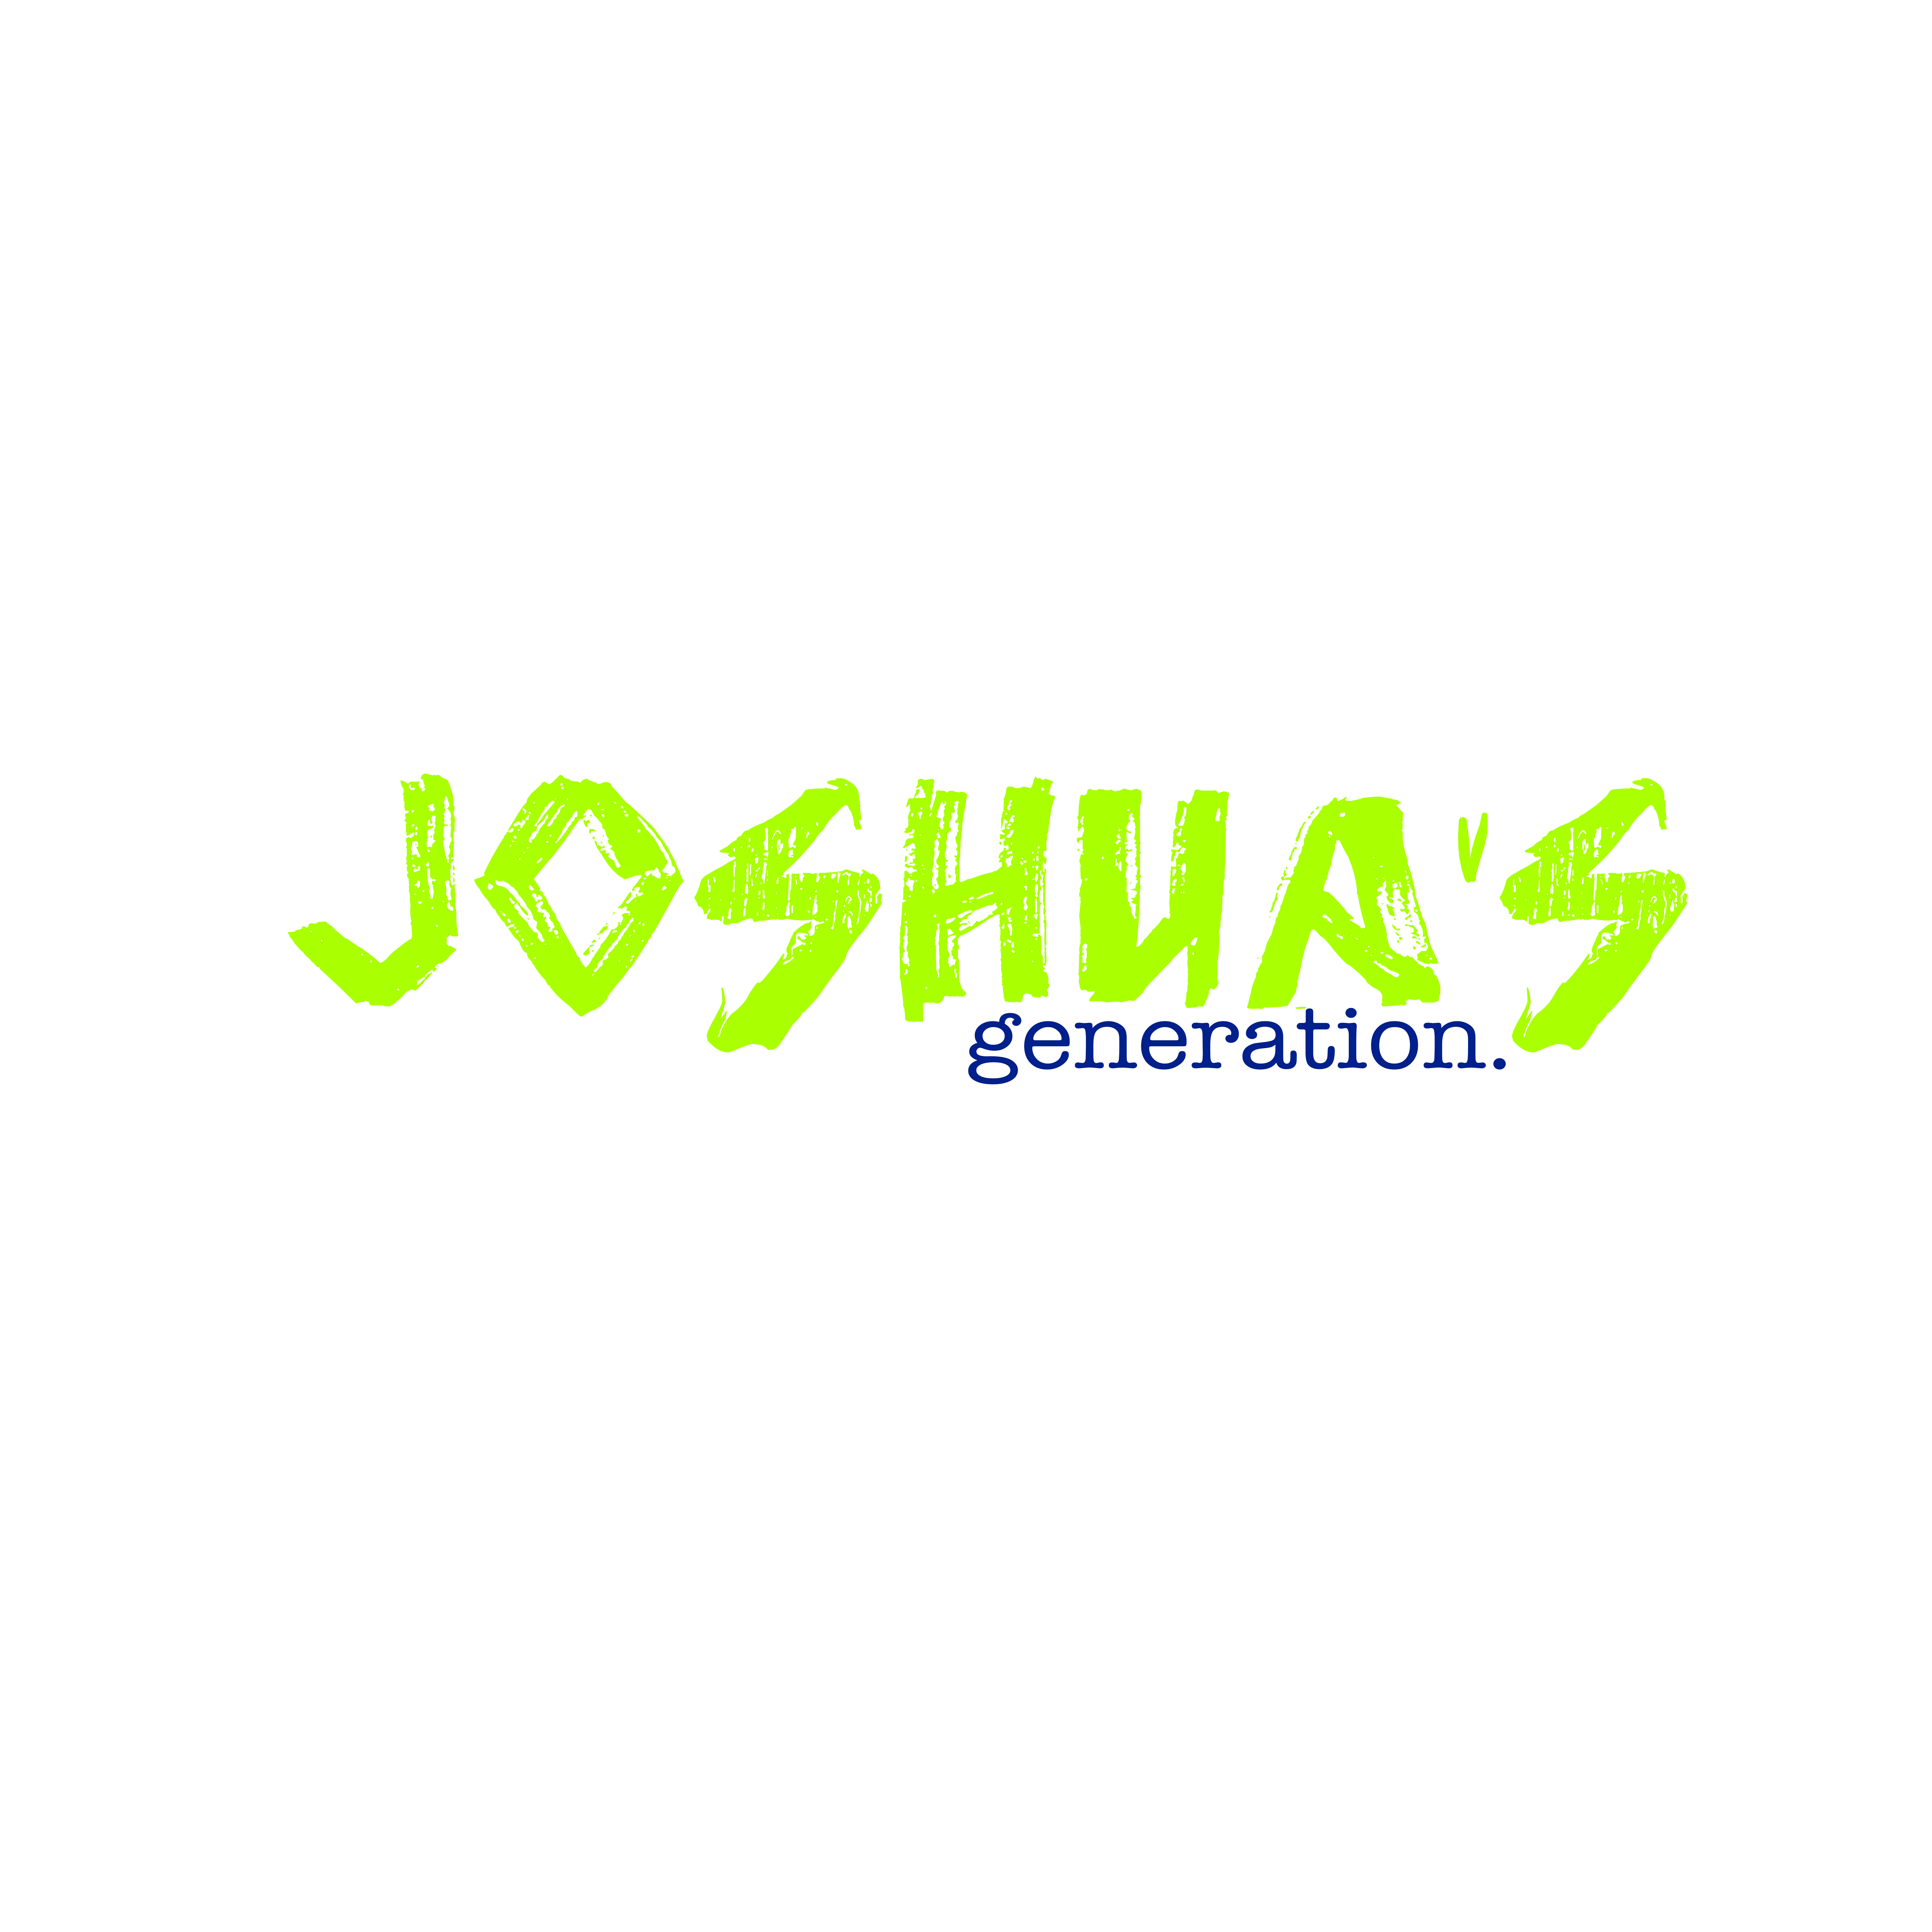 Joshua's Generation